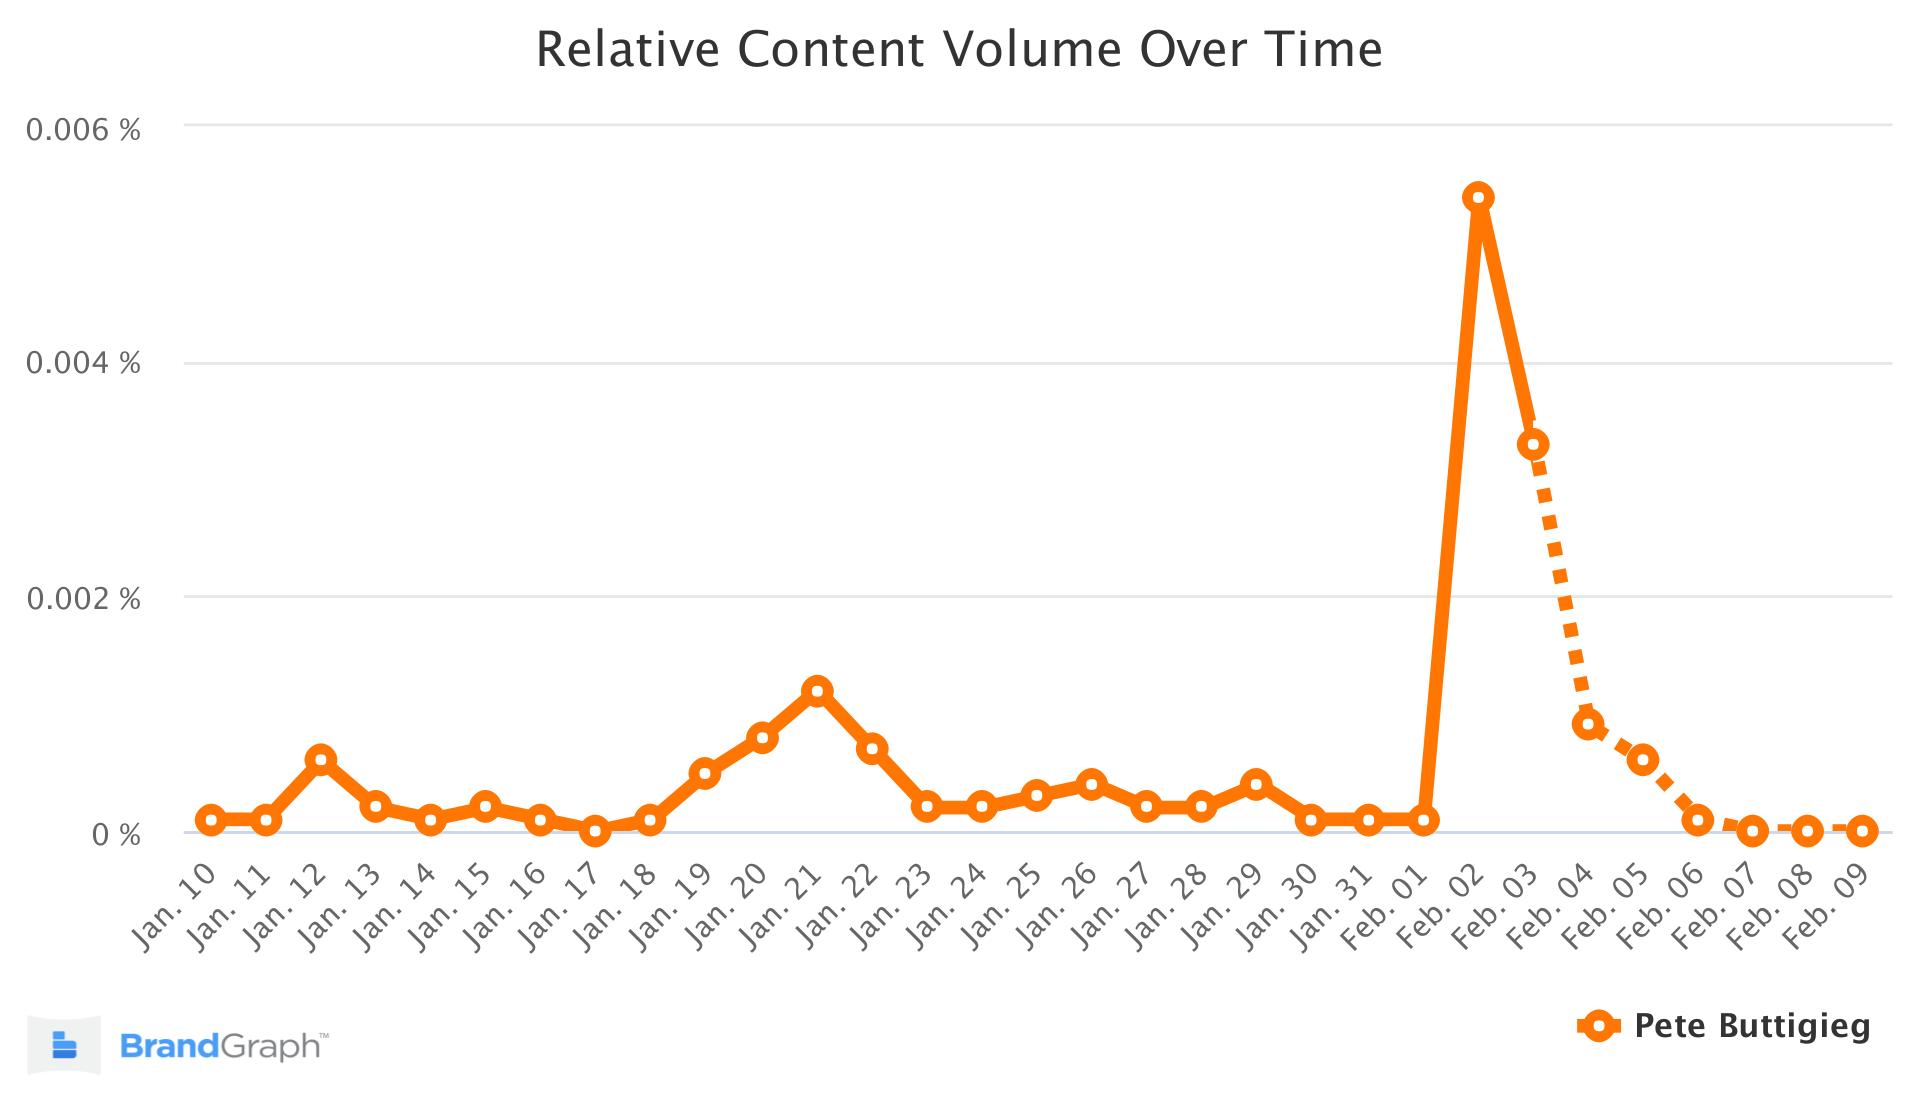 Pete Buttigieg BrandGraph Trend